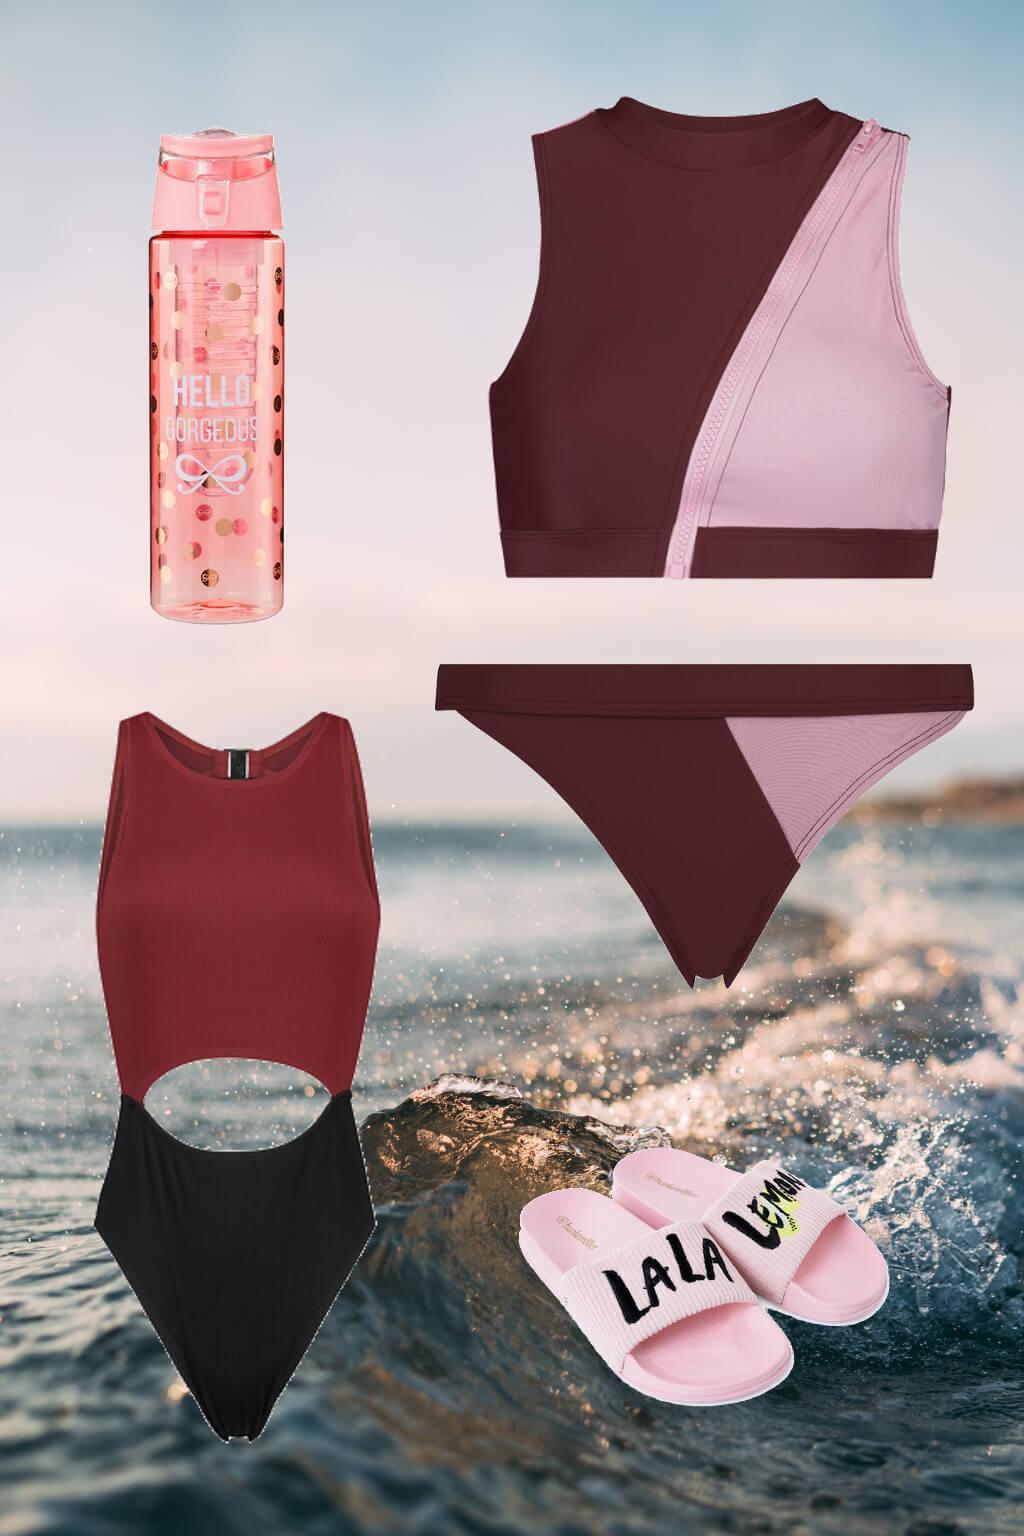 bademode sportlich badeanzug trends 2019 hunkemöller stripes shopping tantedine